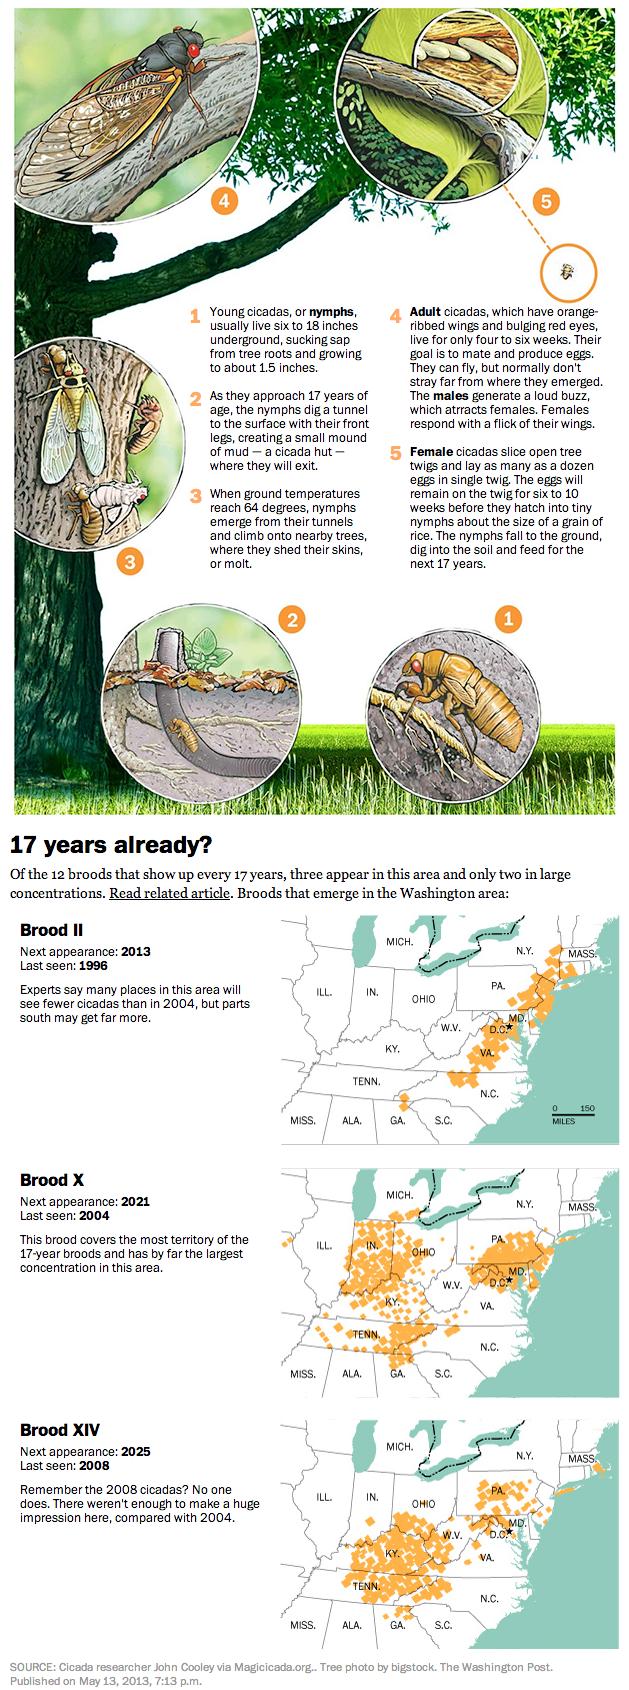 The Washington Post's explanation of the periodical cicadas